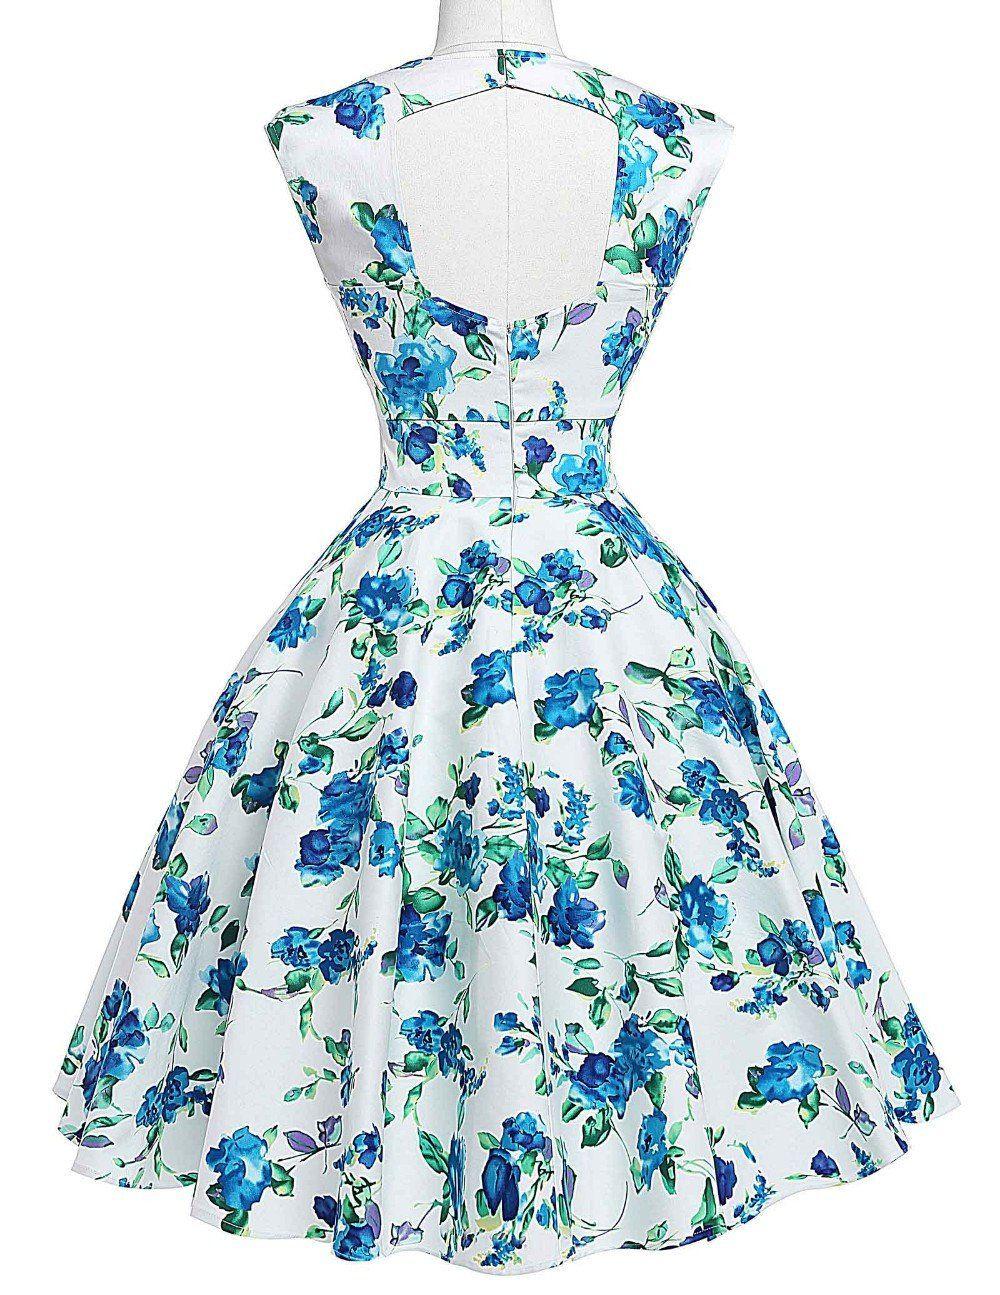 Casual Stylish Rockabilly Party Dress | Dress types, Cotton spandex ...